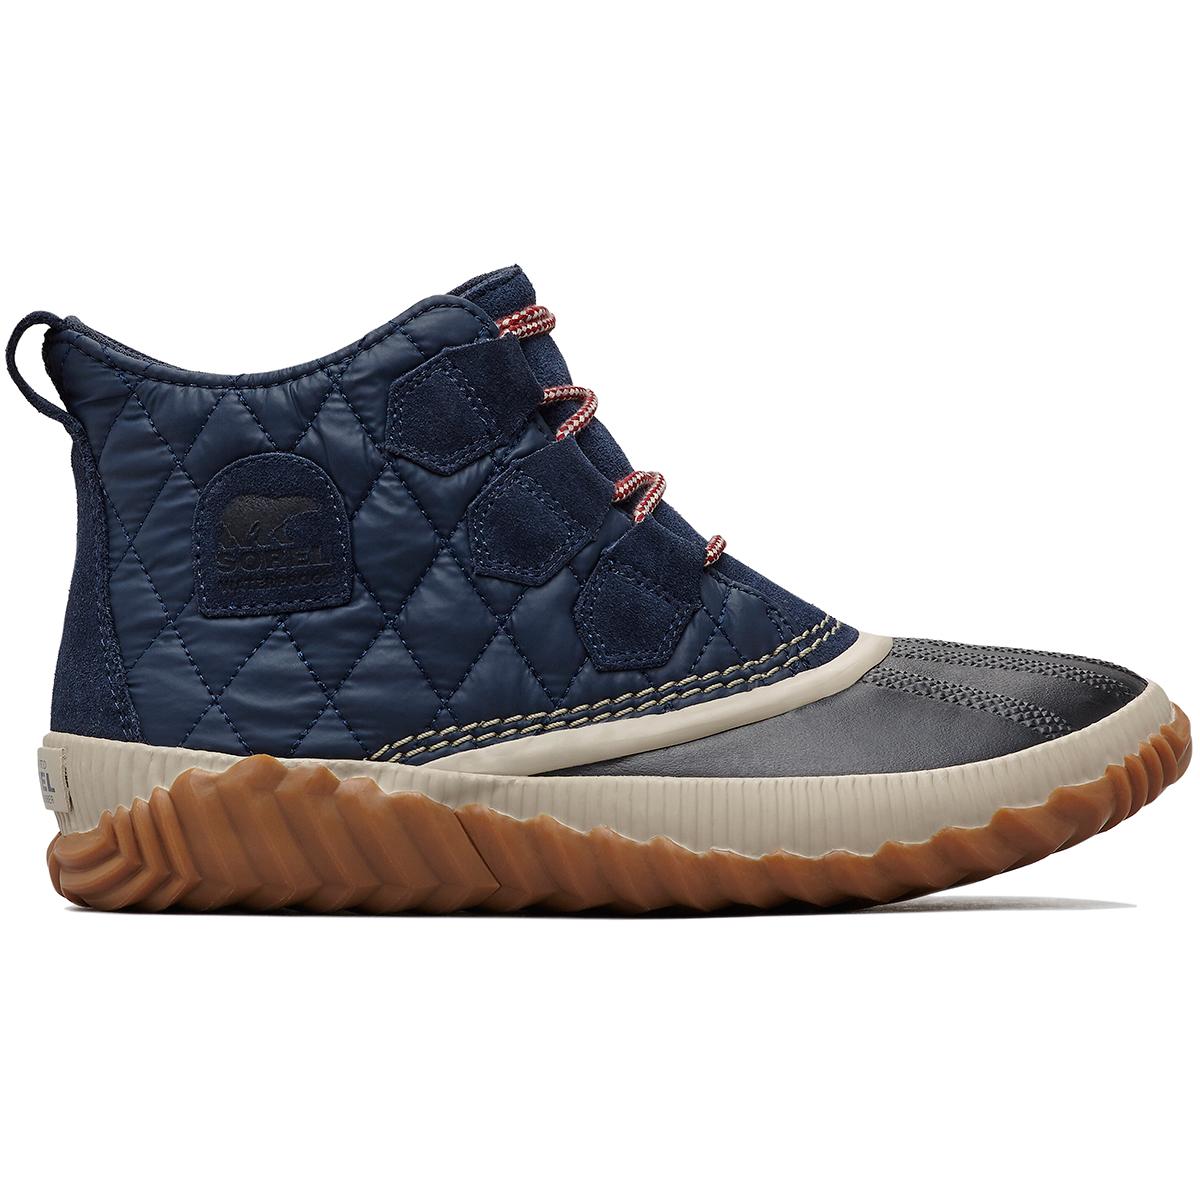 Sorel Women's Out 'n About Plus Waterproof Duck Boots - Blue, 7.5